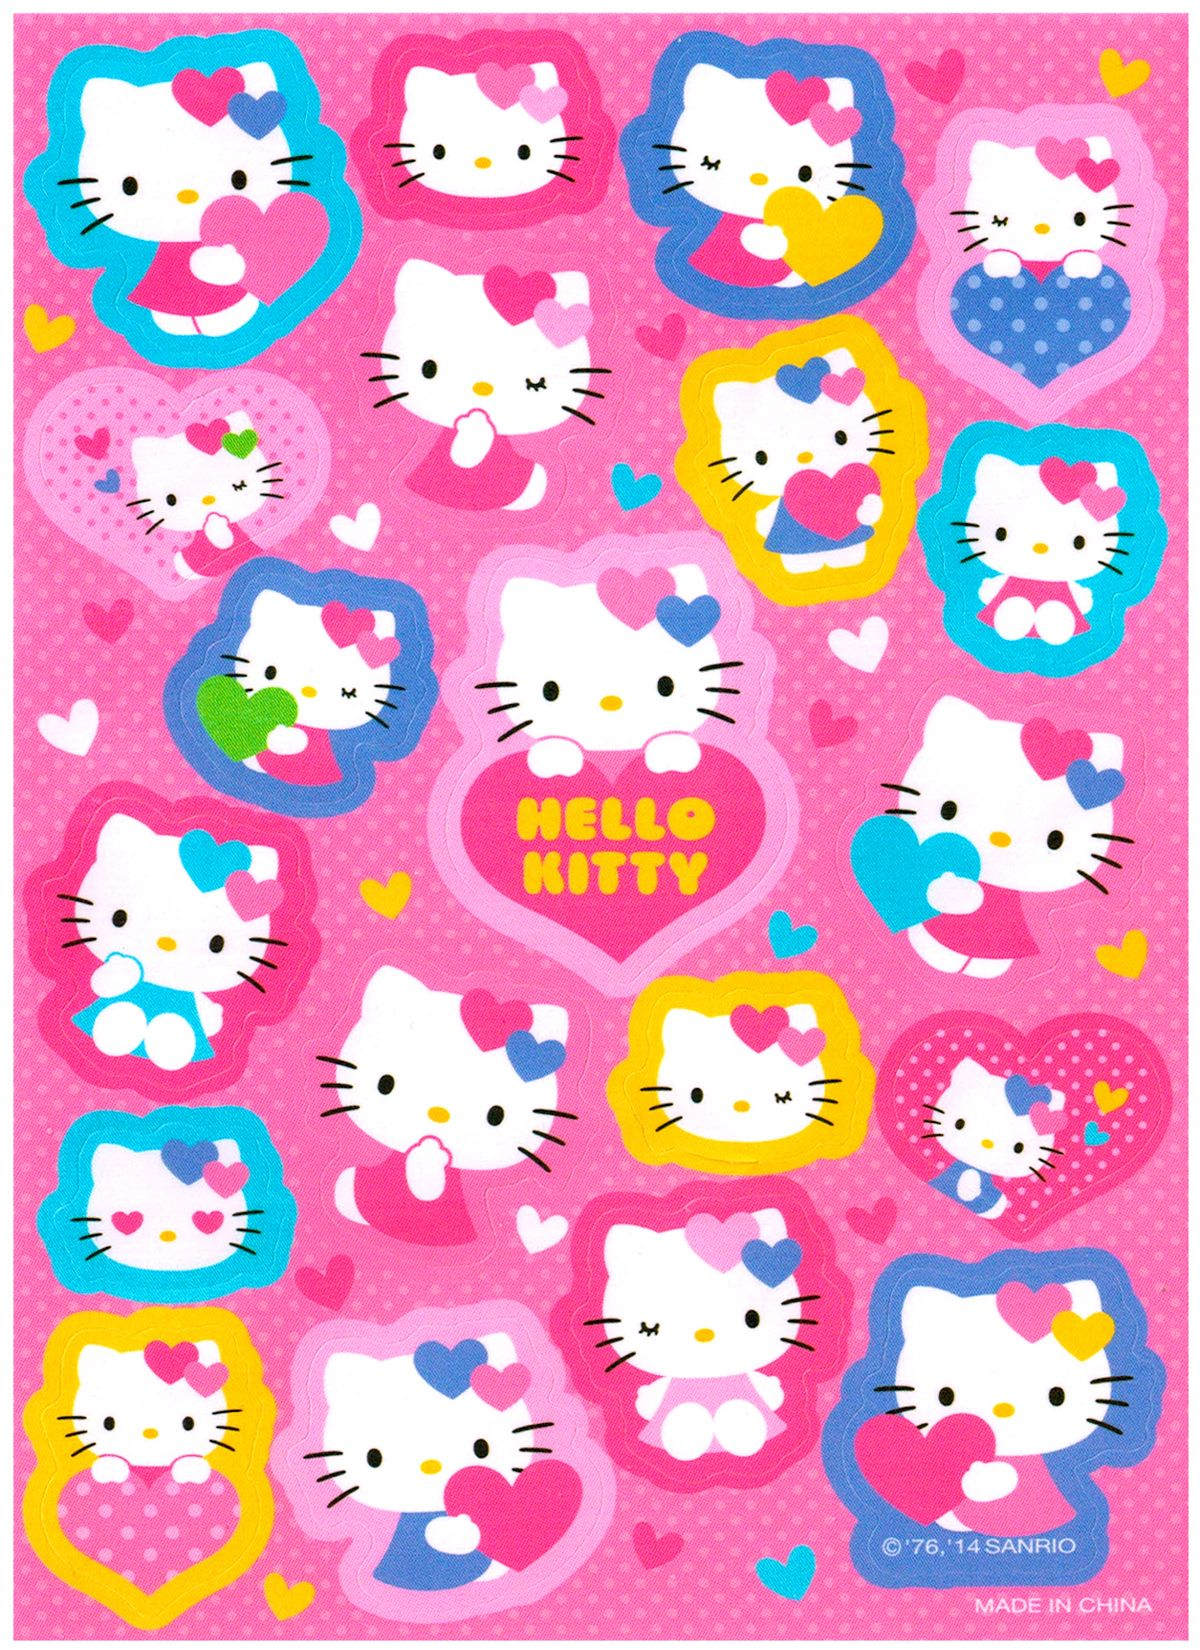 sanrio hello kitty hearts diecut sticker sheet